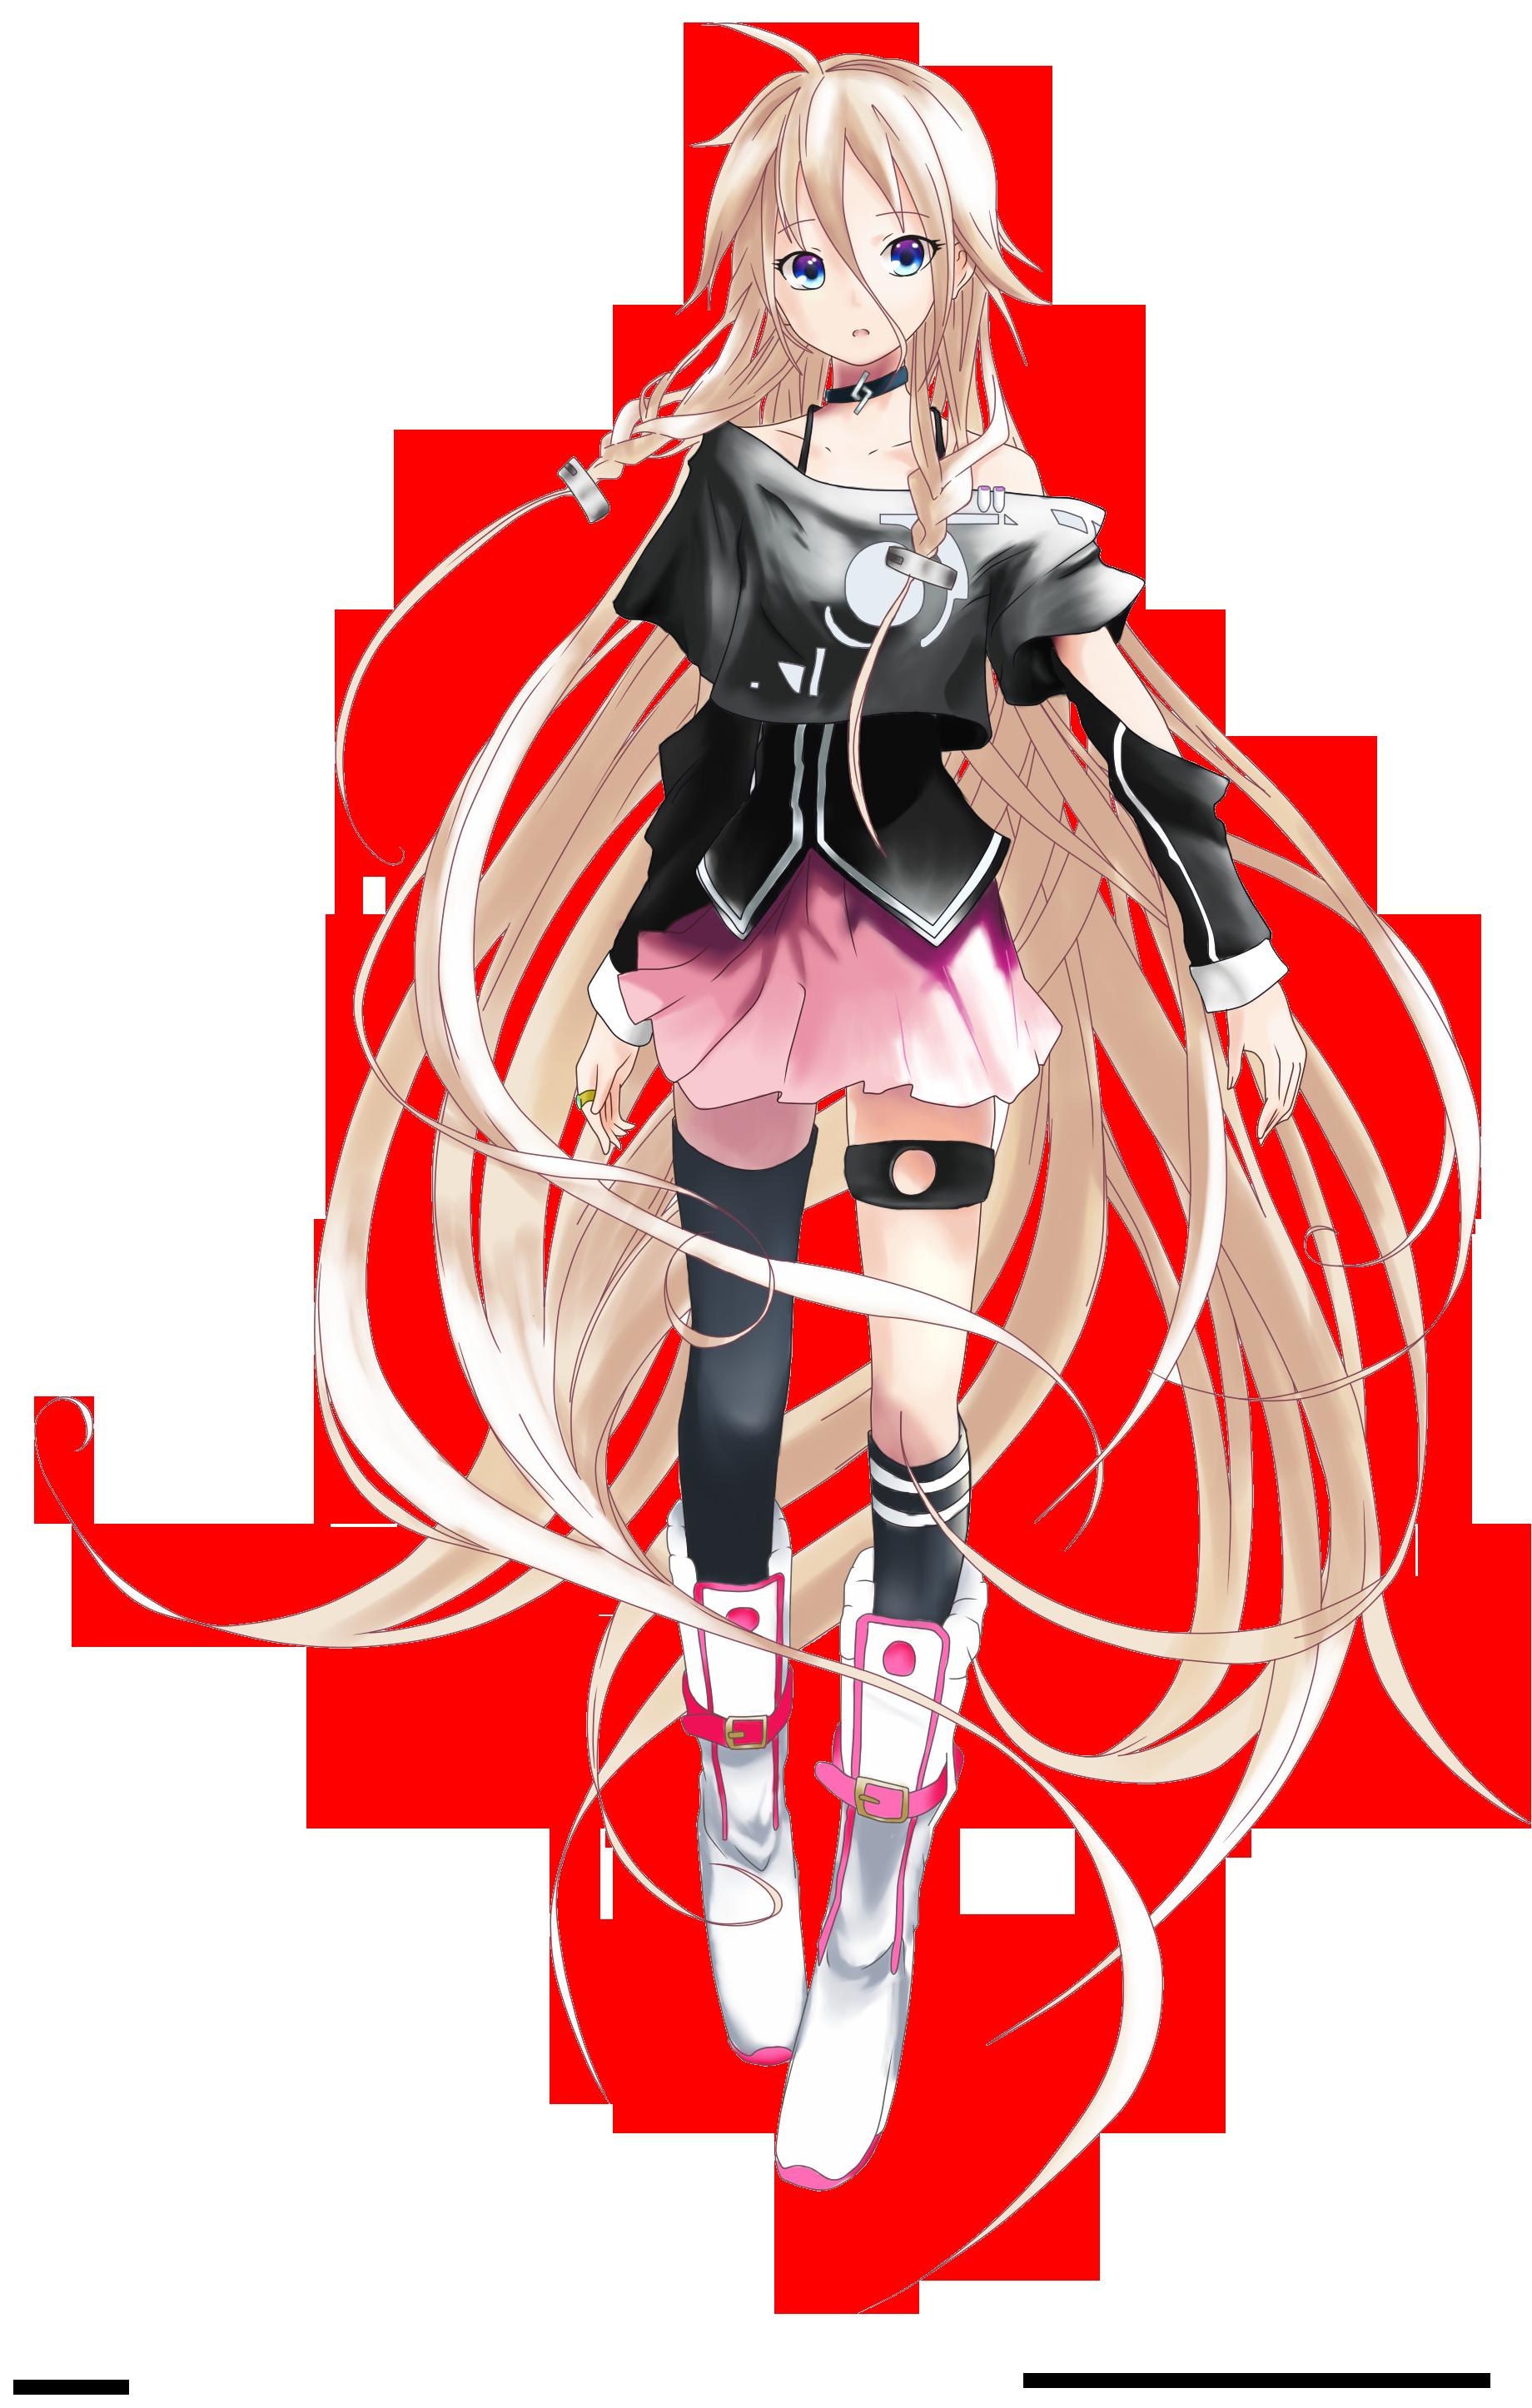 Vocaloid 3 - IA/01 - by Rock-Snake on DeviantArt